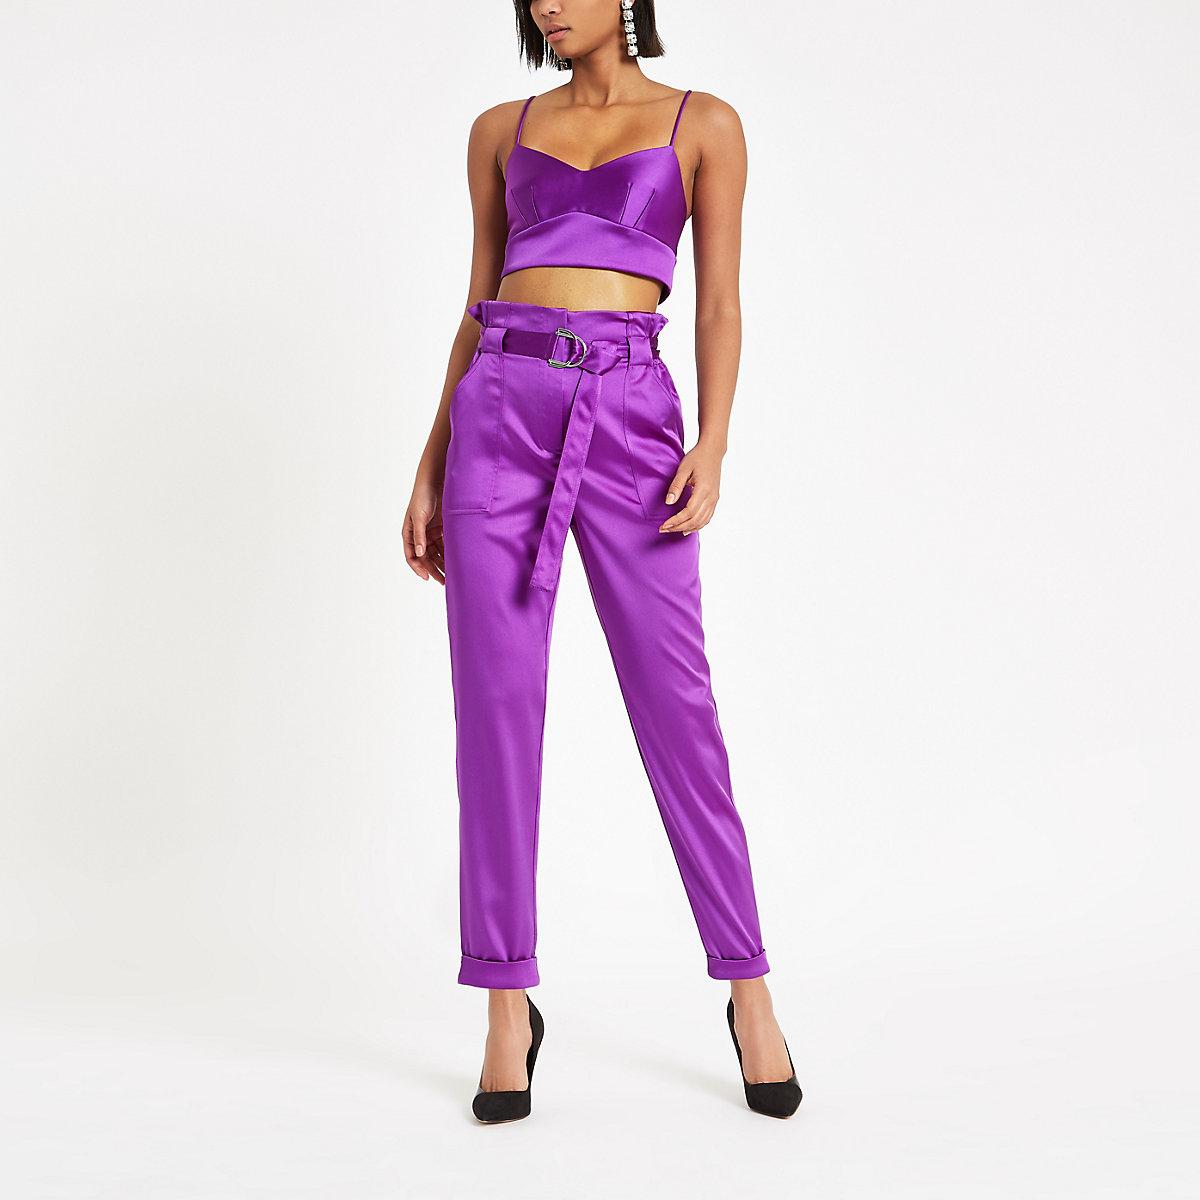 Purple satin bralette